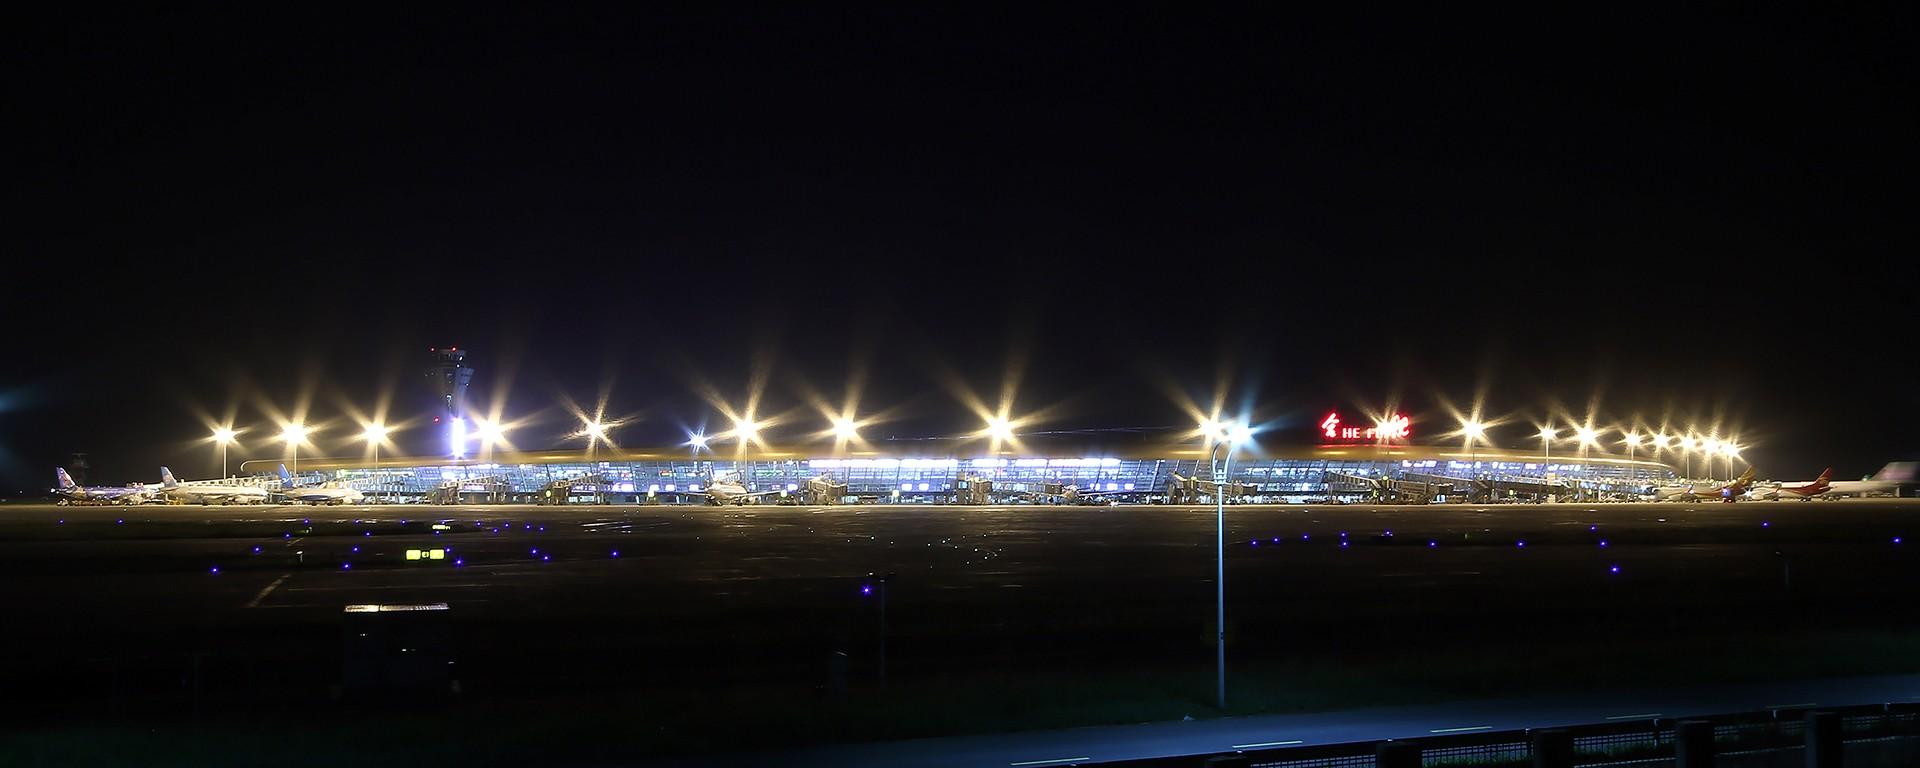 Re:[原创][合肥飞友会]霸都打鸡 找个机会白天打华航 顺便看看期待已久的迪斯尼    中国合肥新桥国际机场